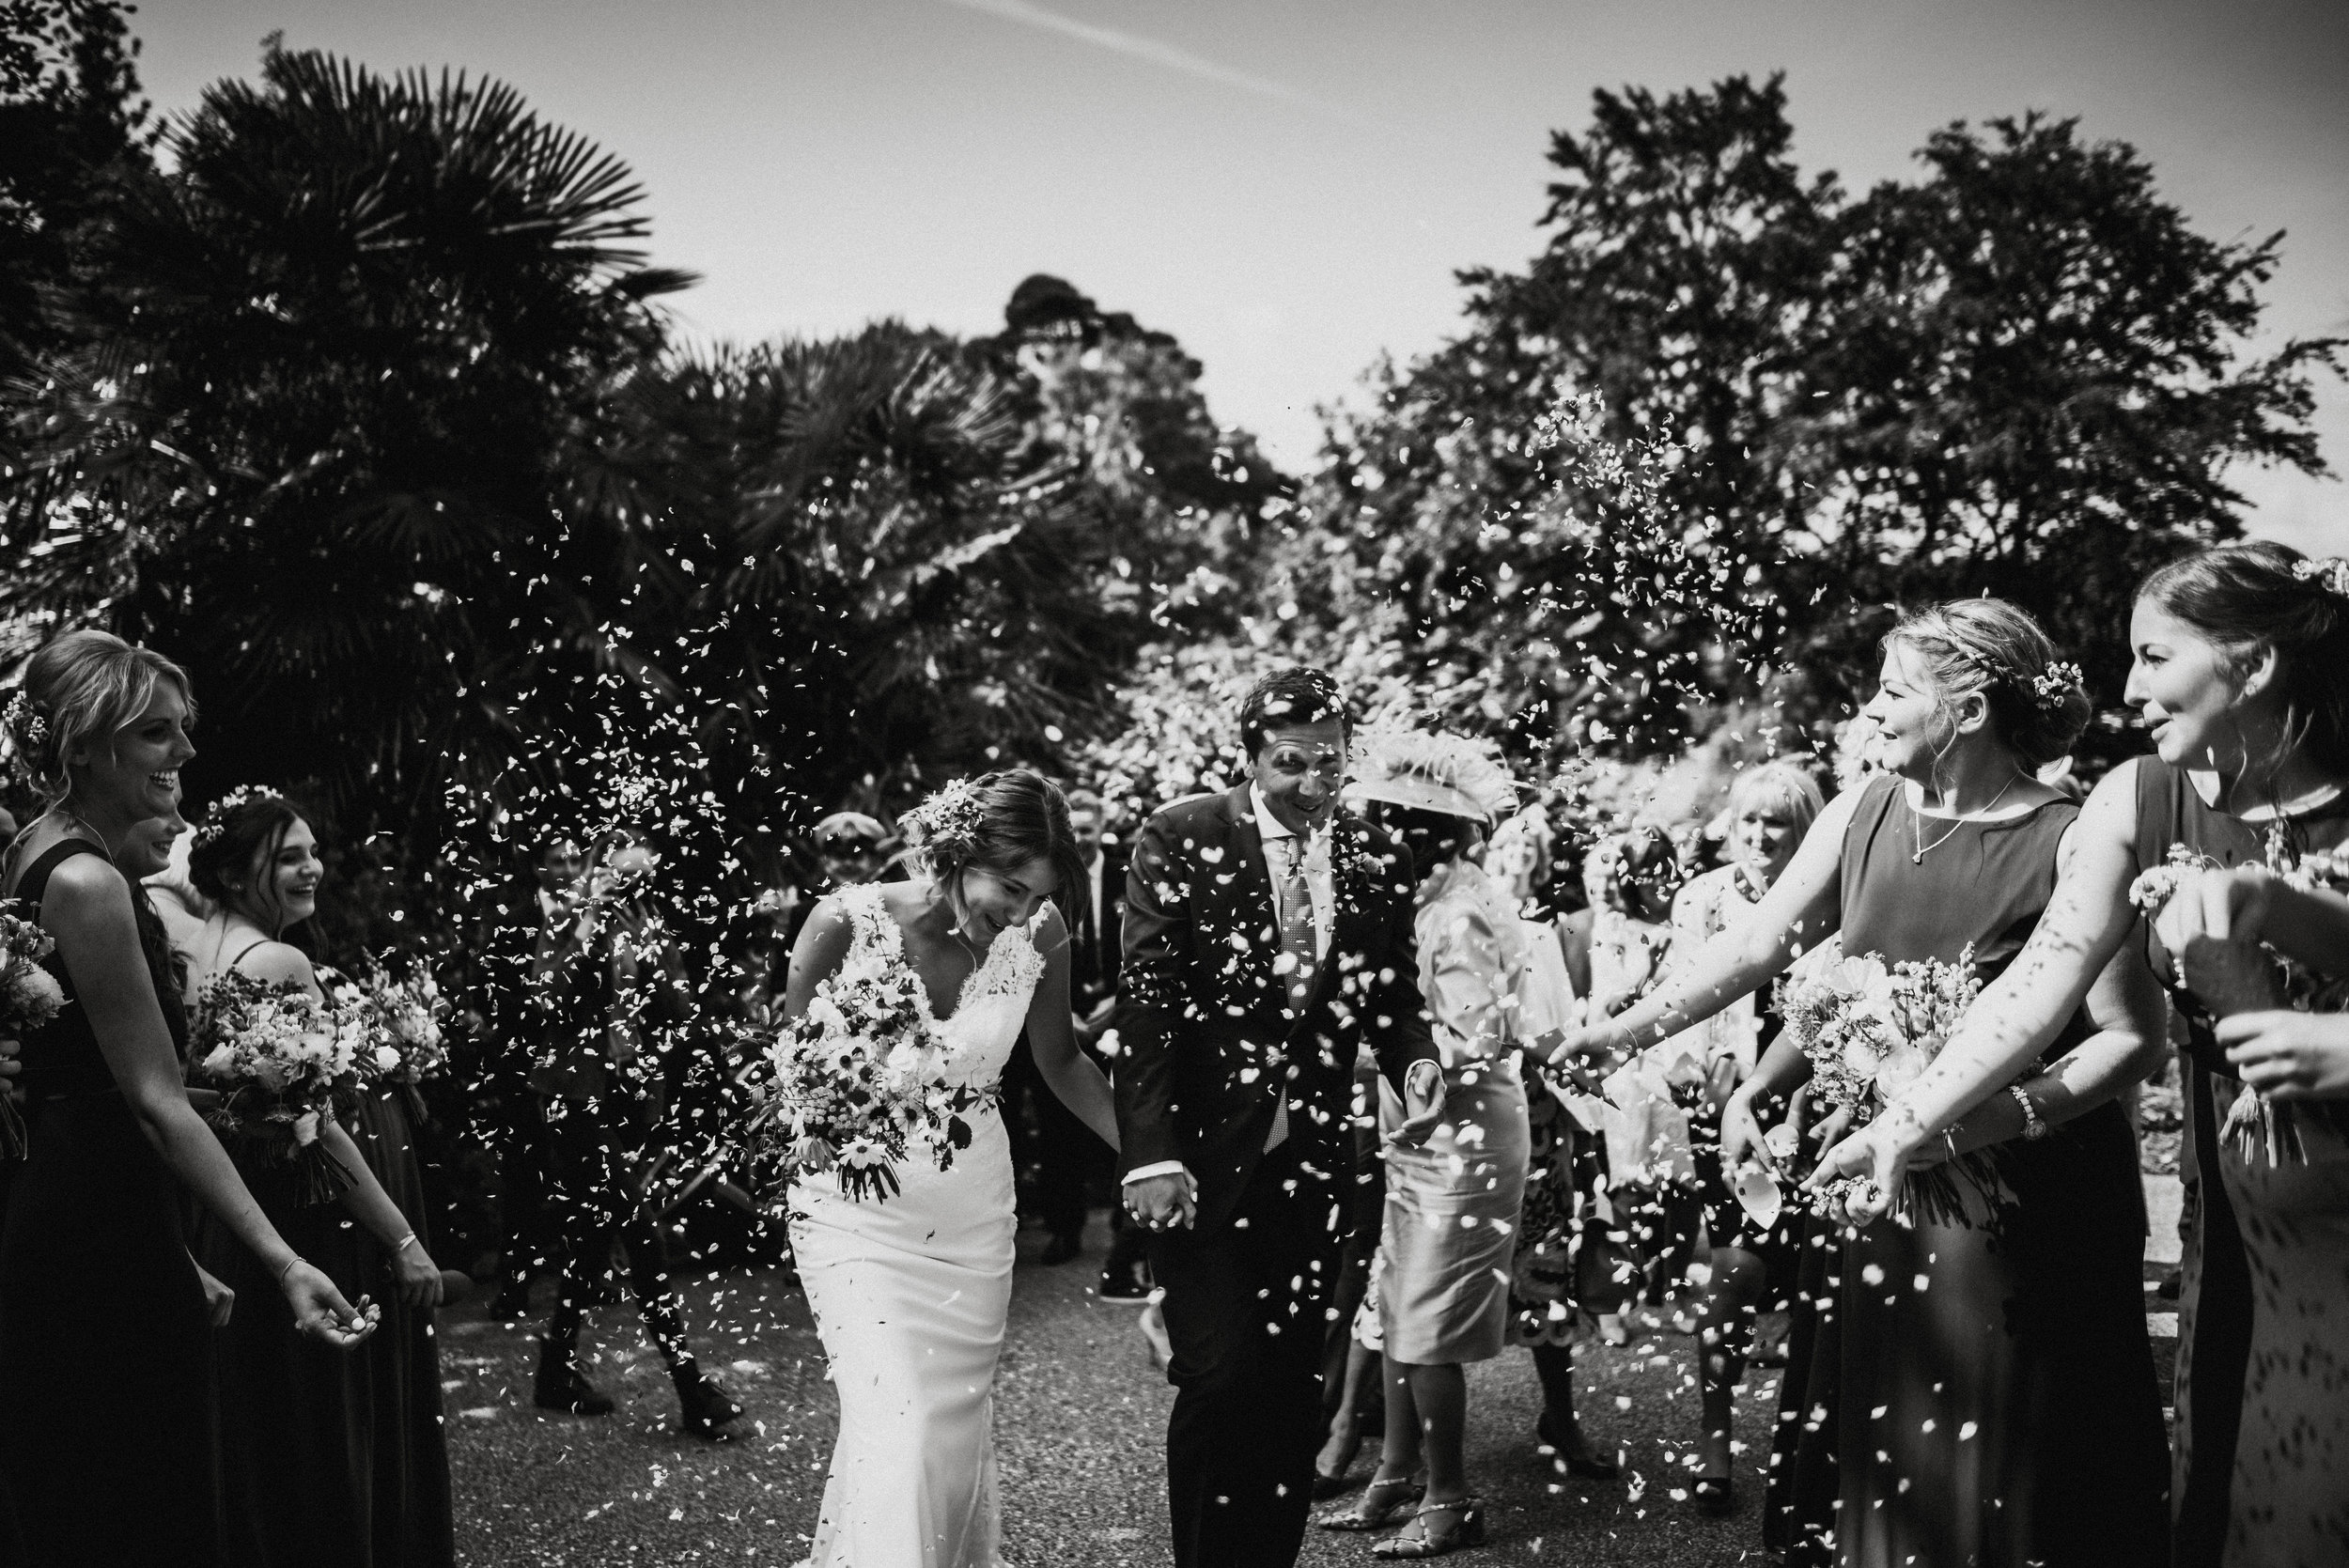 st-just-wedding-photographer-2.jpg